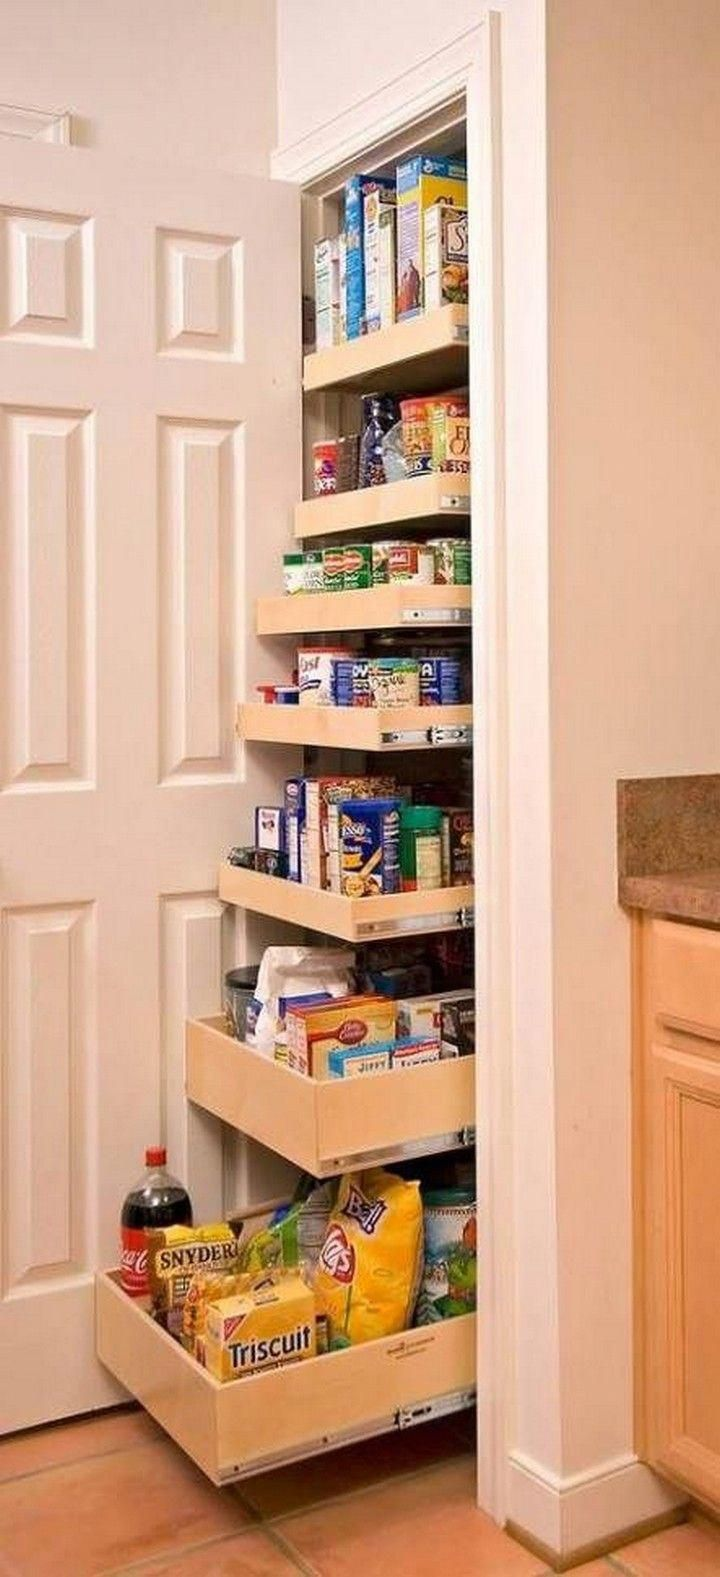 Kitchenshelvingideas In 2020 Pantry Shelving Space Saving Kitchen Small Kitchen Storage